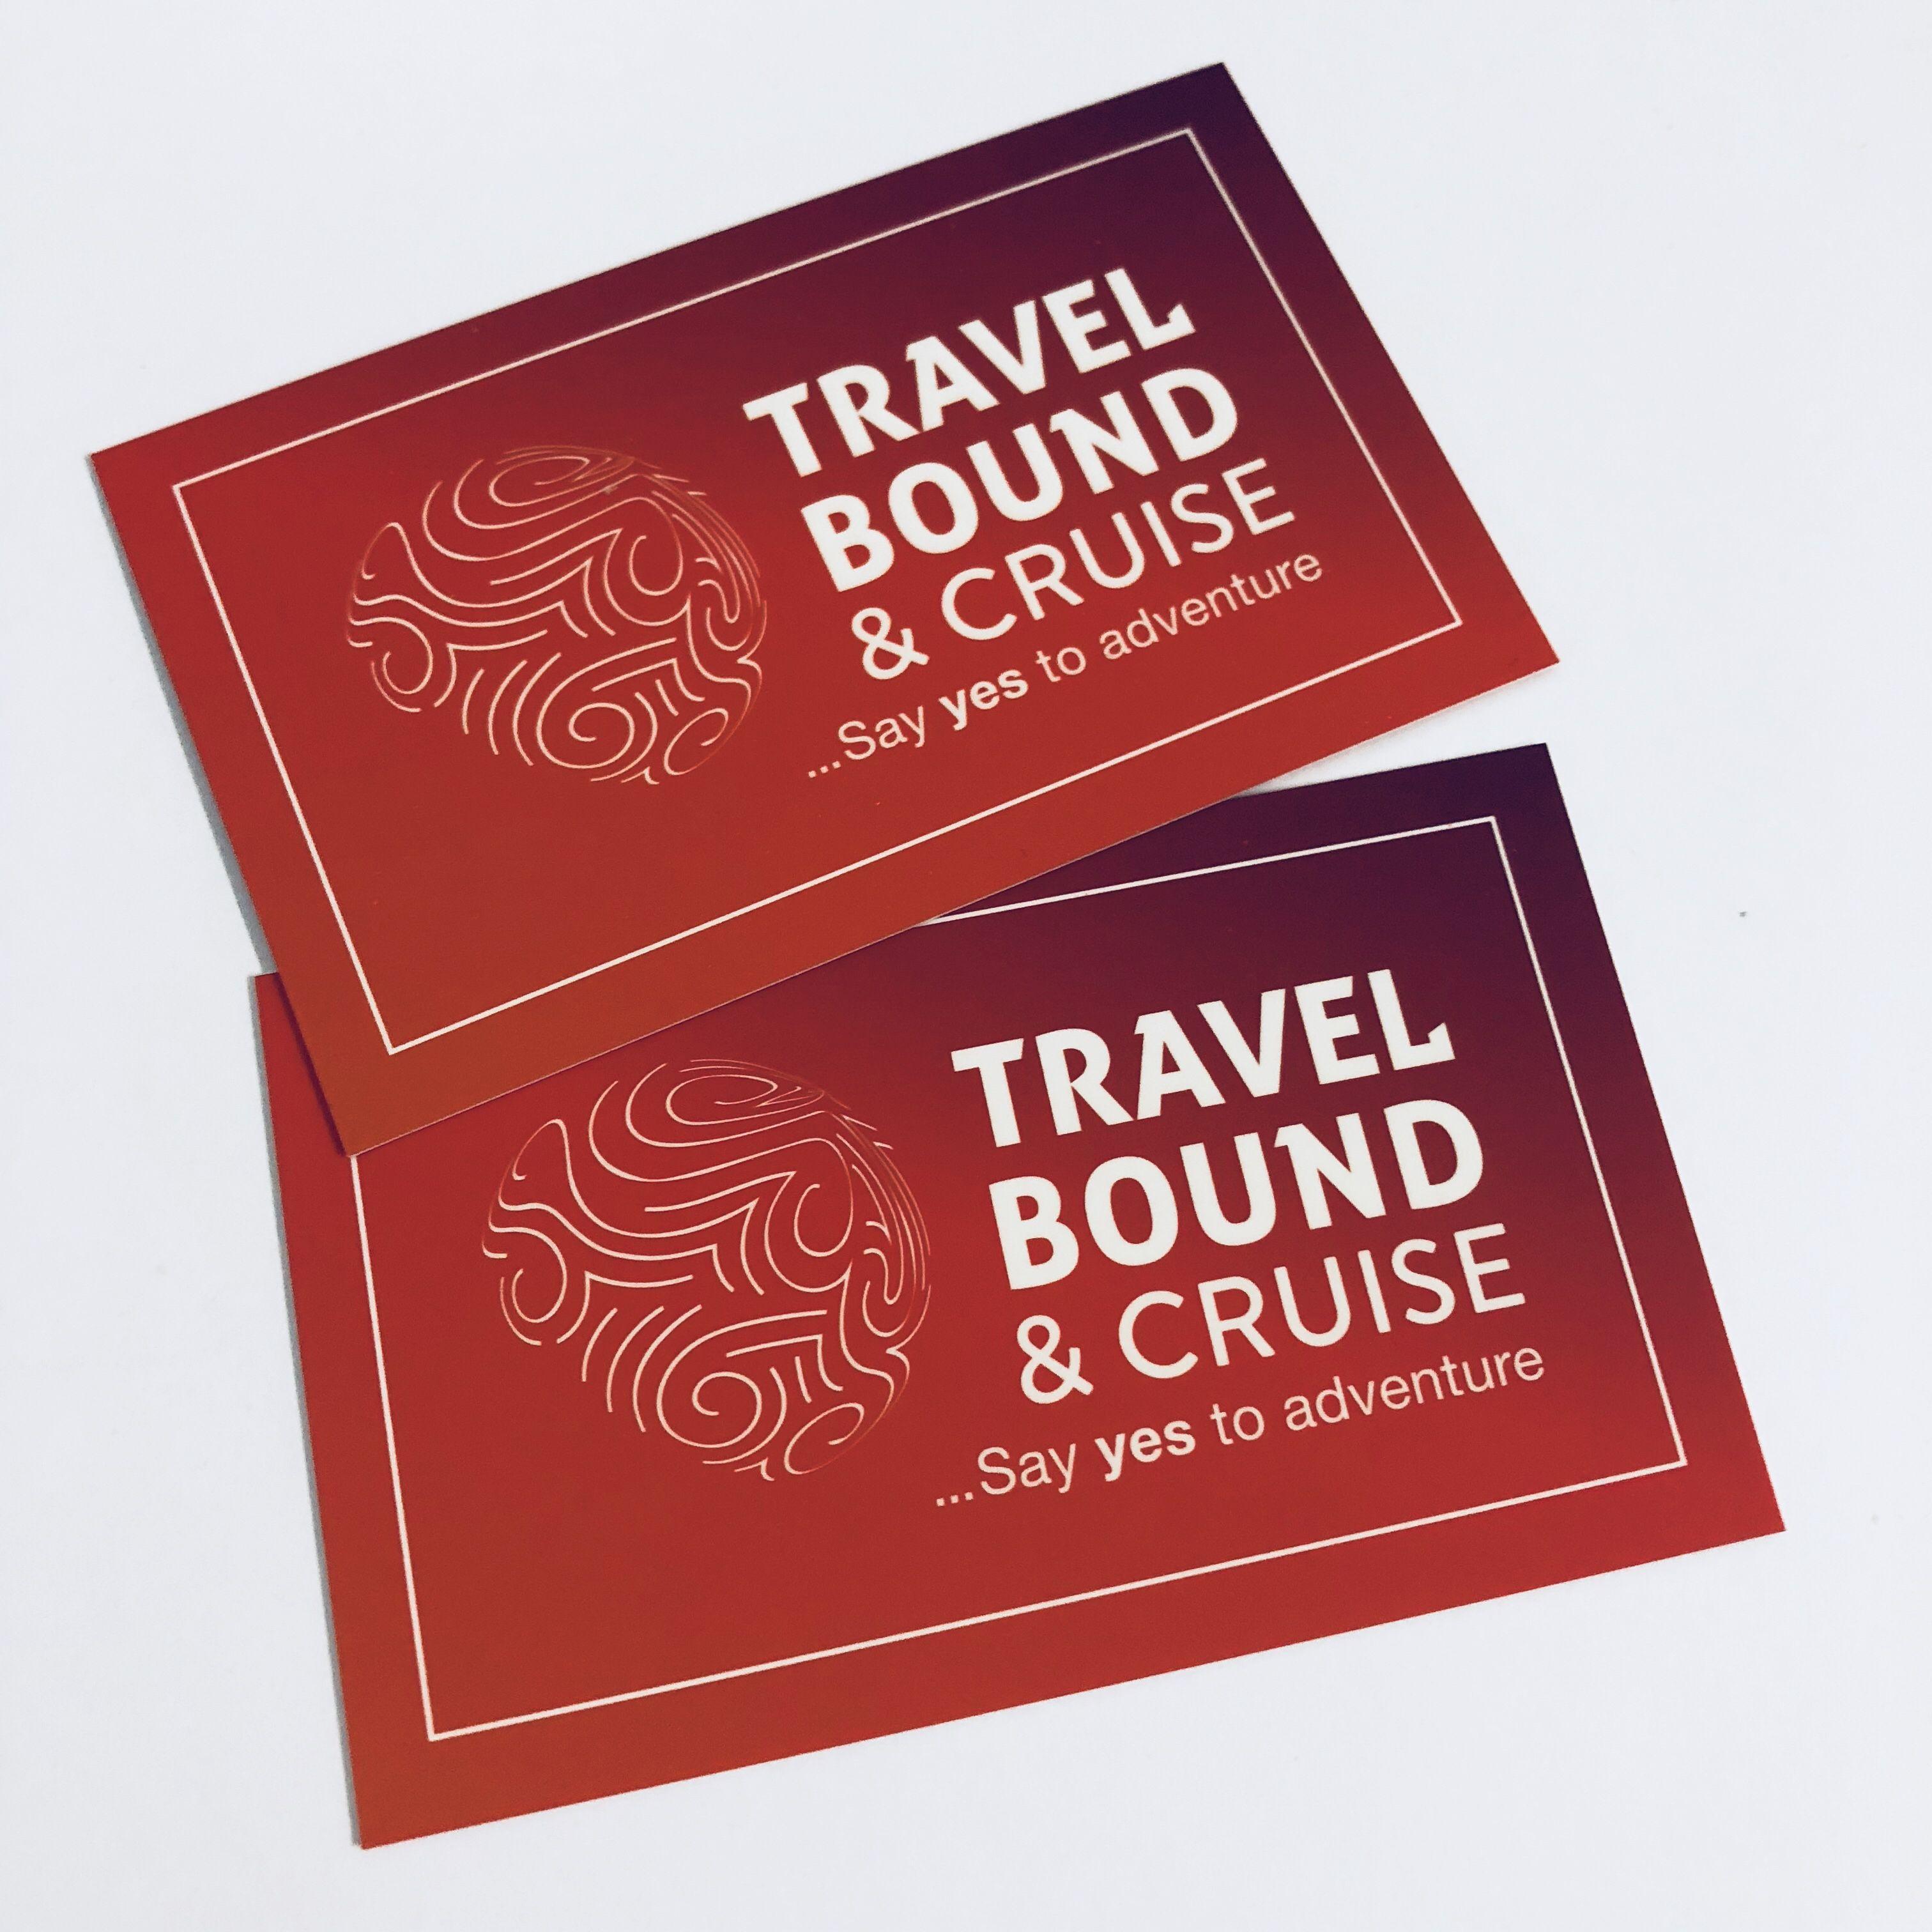 Spot Uv Businesscards For Travelboundandcruise Melbourne Printing Red White Travel Spot Uv Prints Adventure Travel